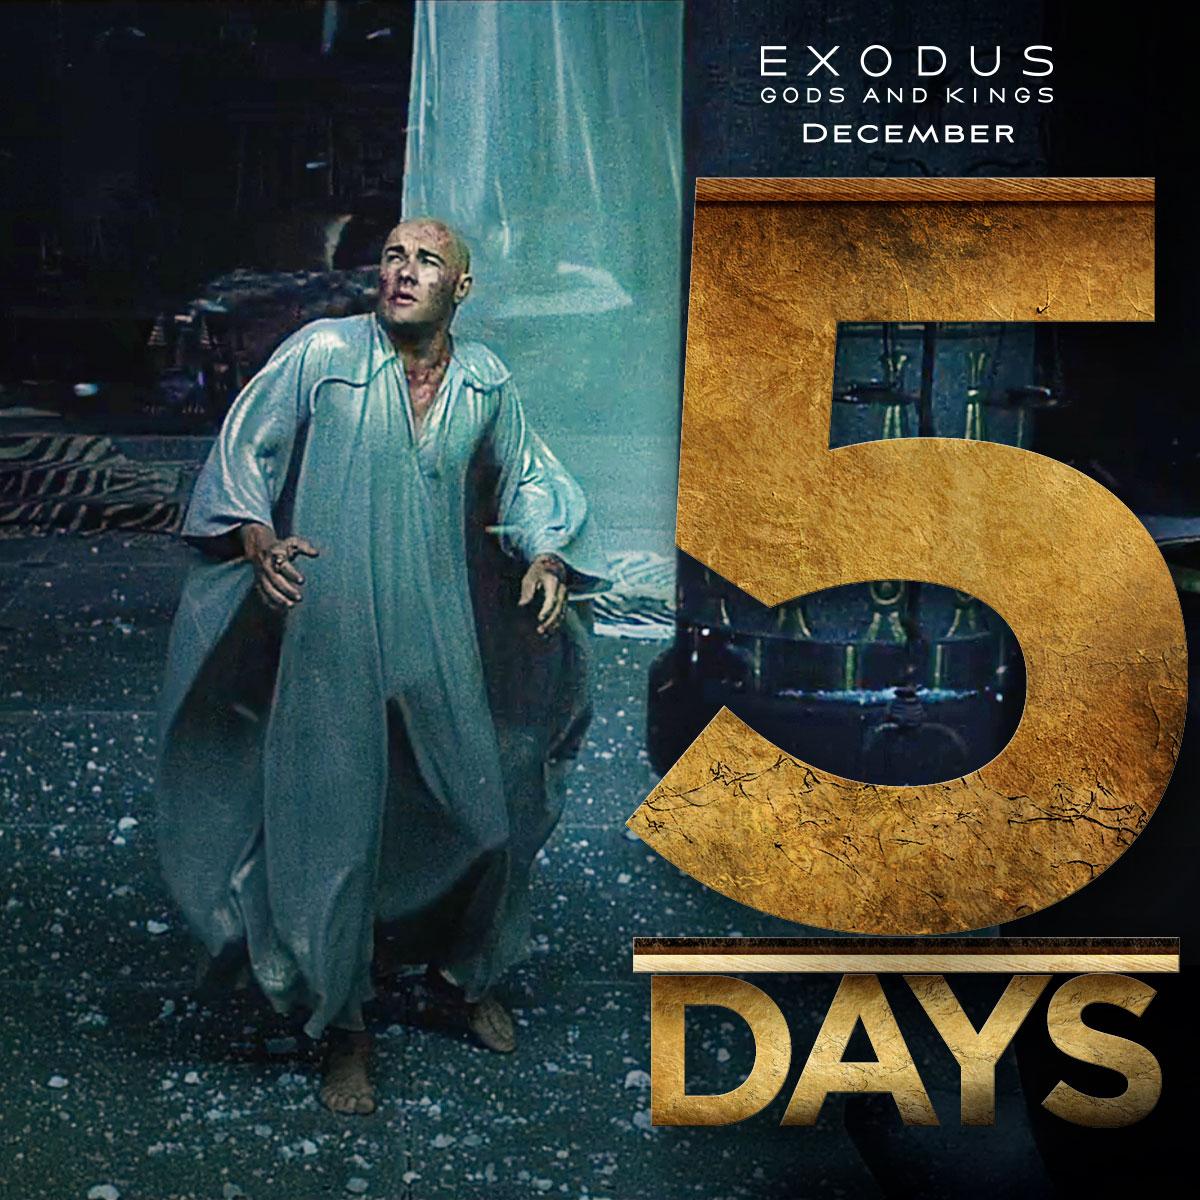 Exodus_social_media_tw